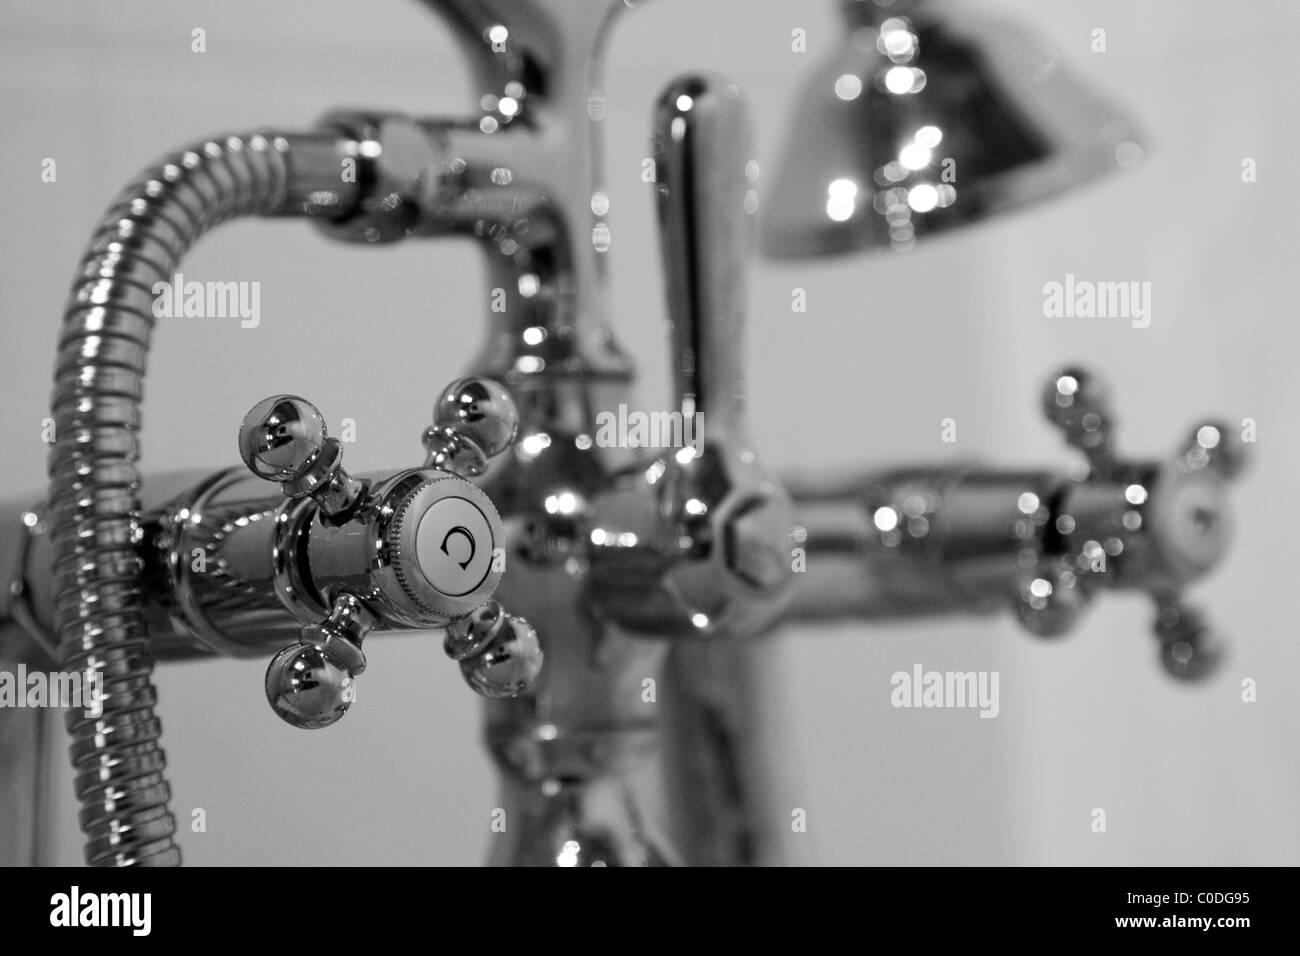 Classic bath taps - Stock Image